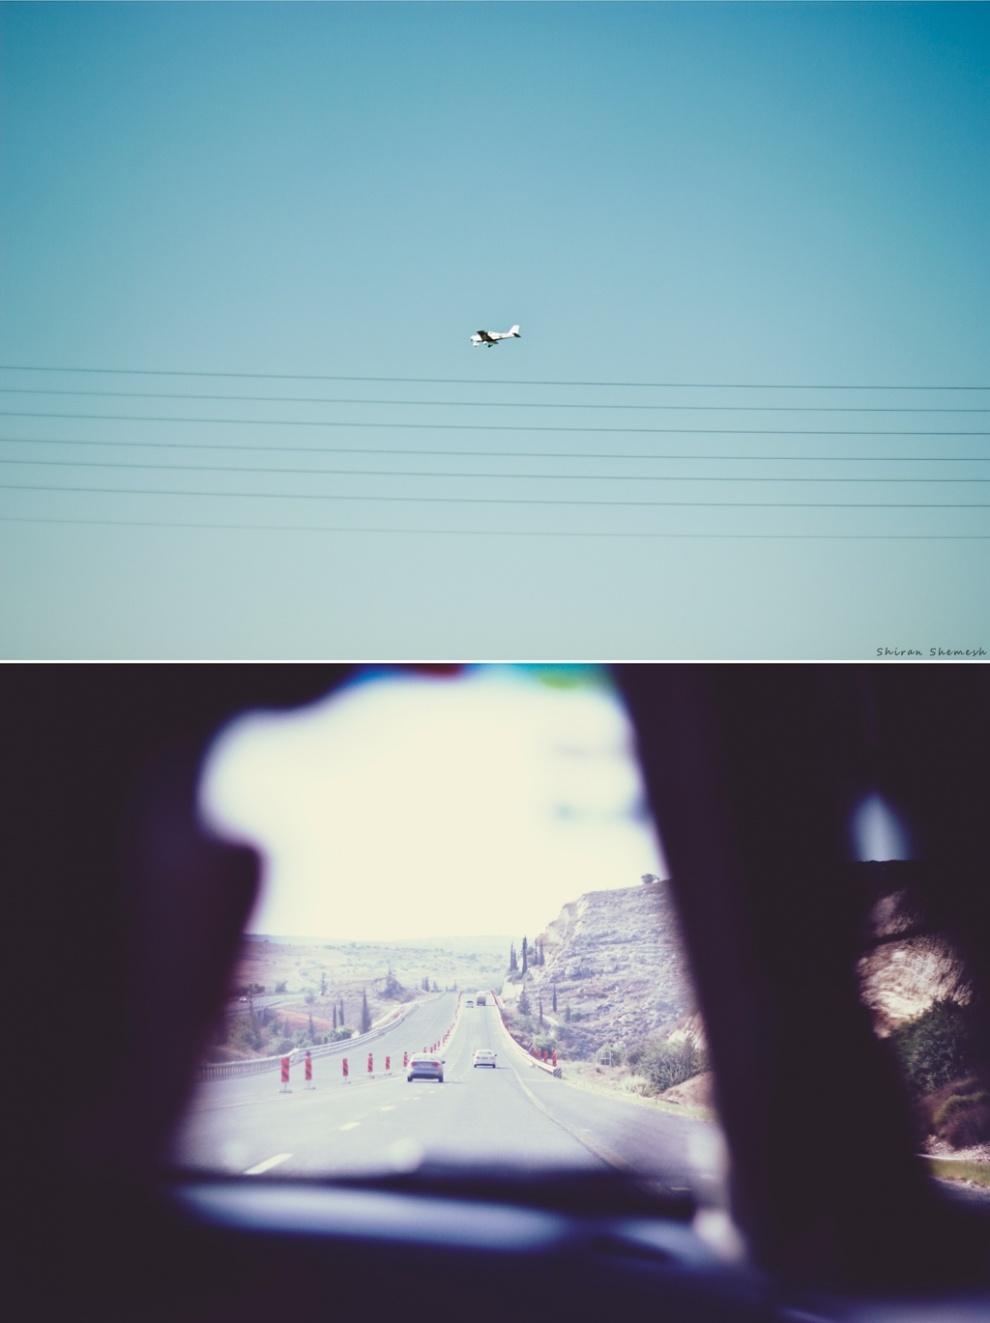 Photographer and Art director - Visual Art